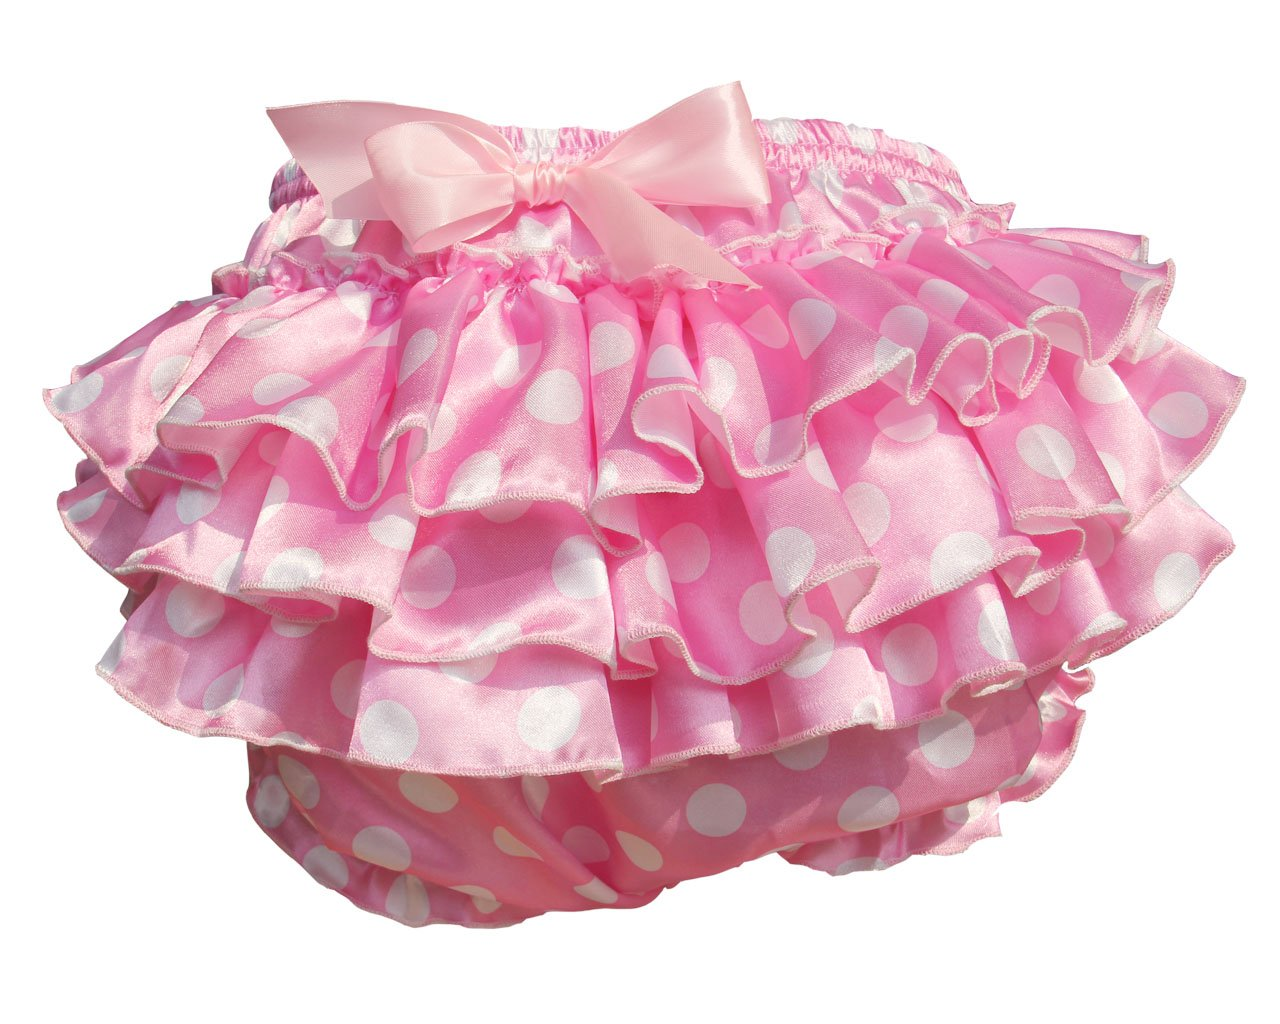 Amazon.com : ABDL Pink Adult Diapers (Medium) : Baby